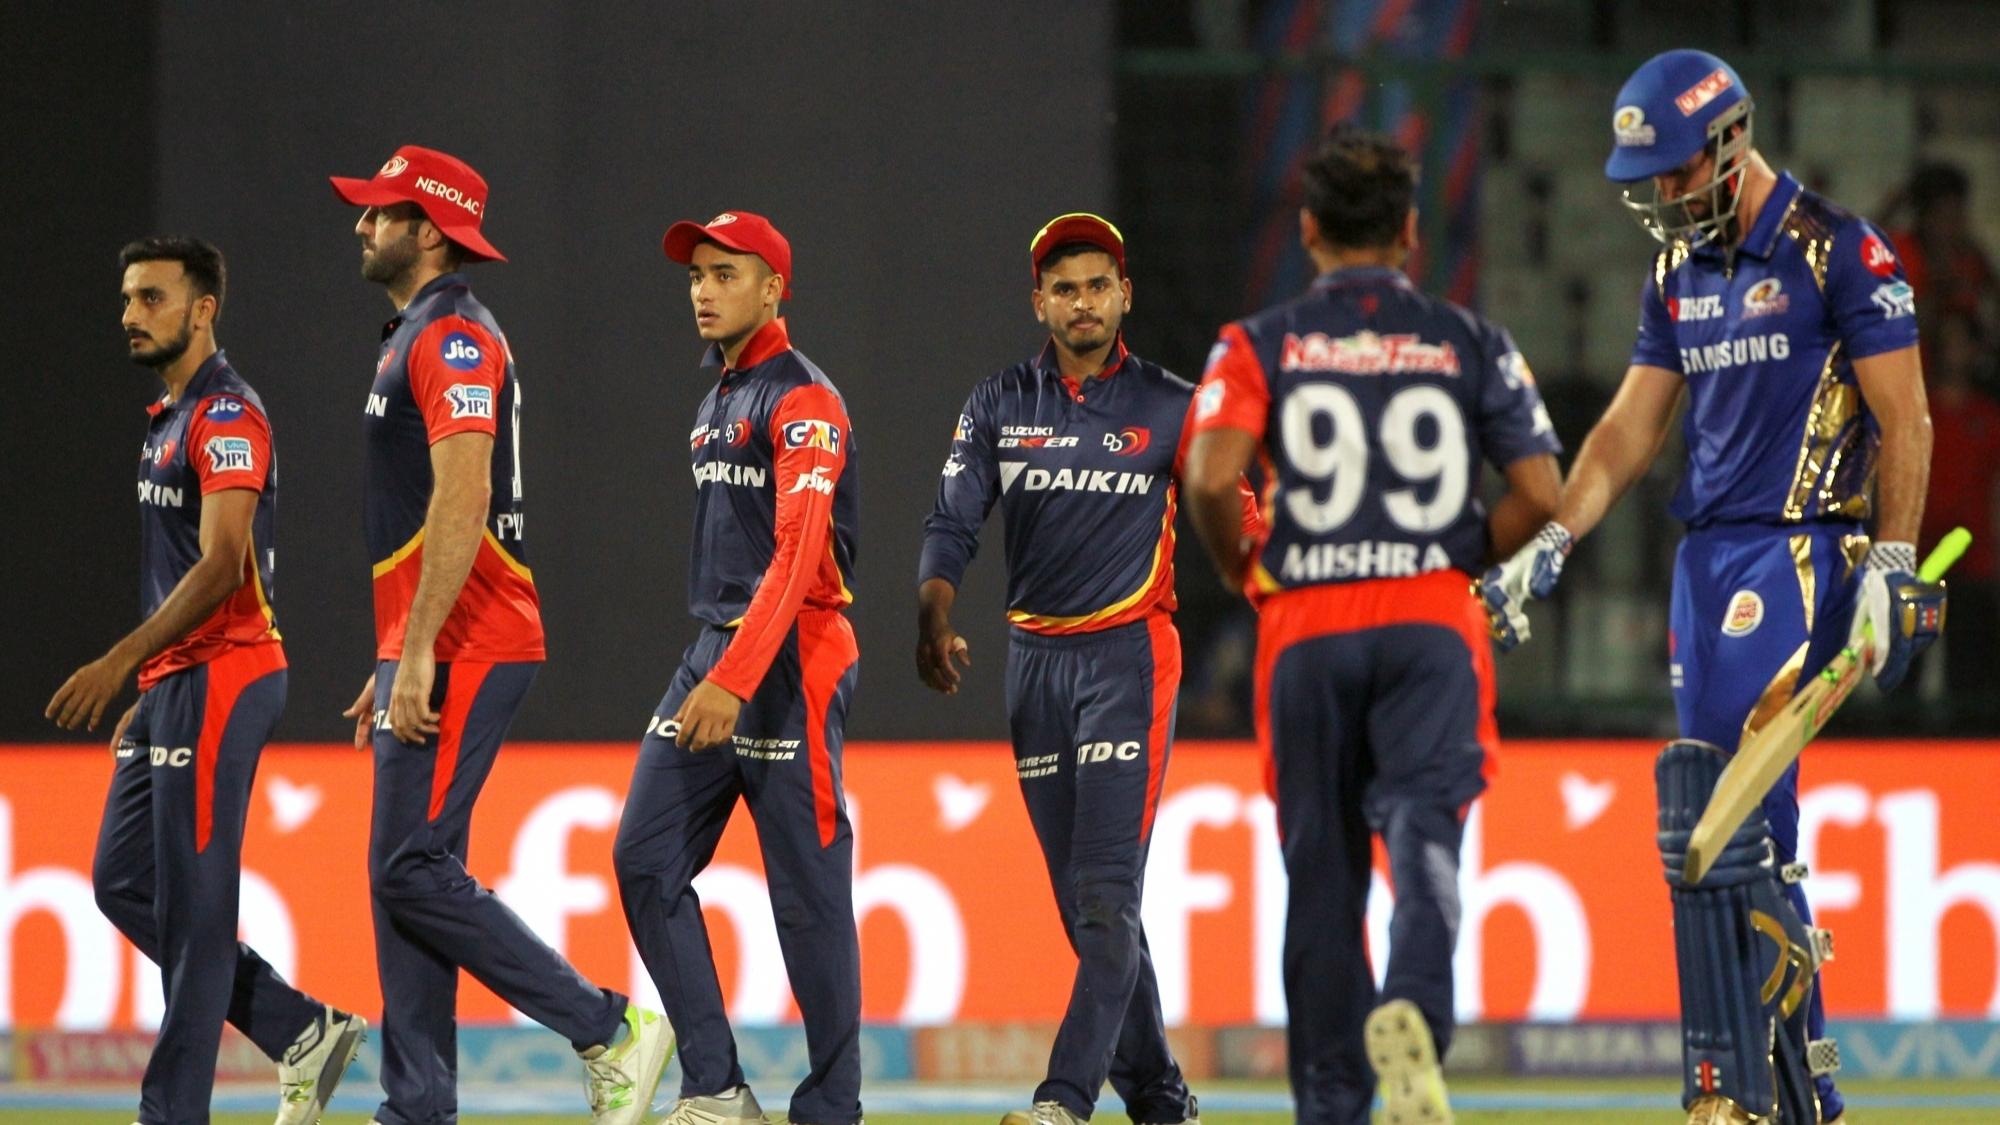 IPL 2018 : Match 55, DD vs MI - Statistical Highlights